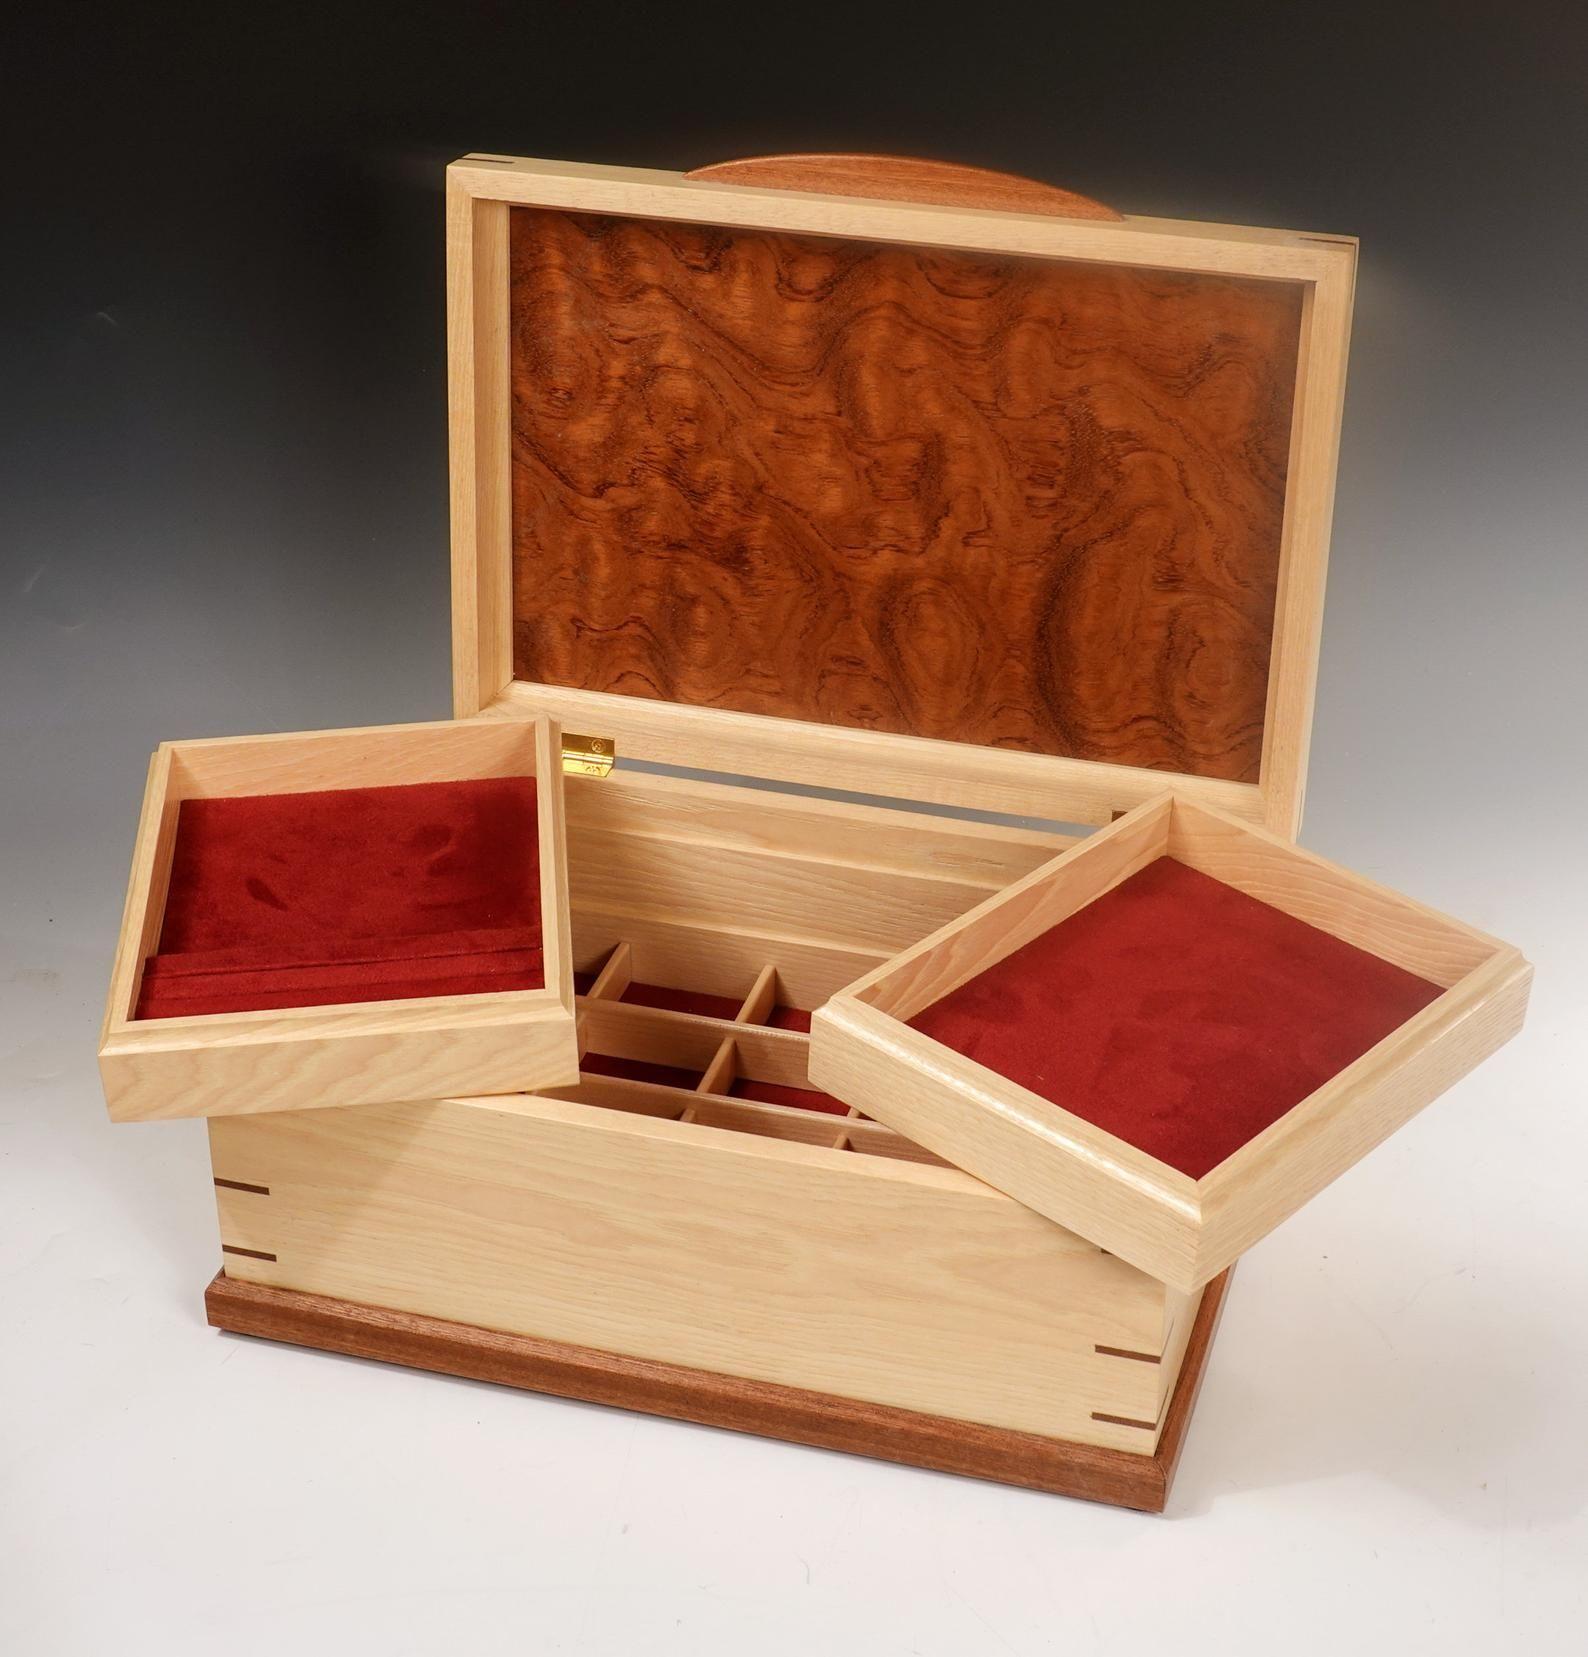 Custom Wood Jewelry Box Heirloom Quality Finely Crafted Etsy Wood Jewelry Box Wood Keepsake Box Wood Jewellery